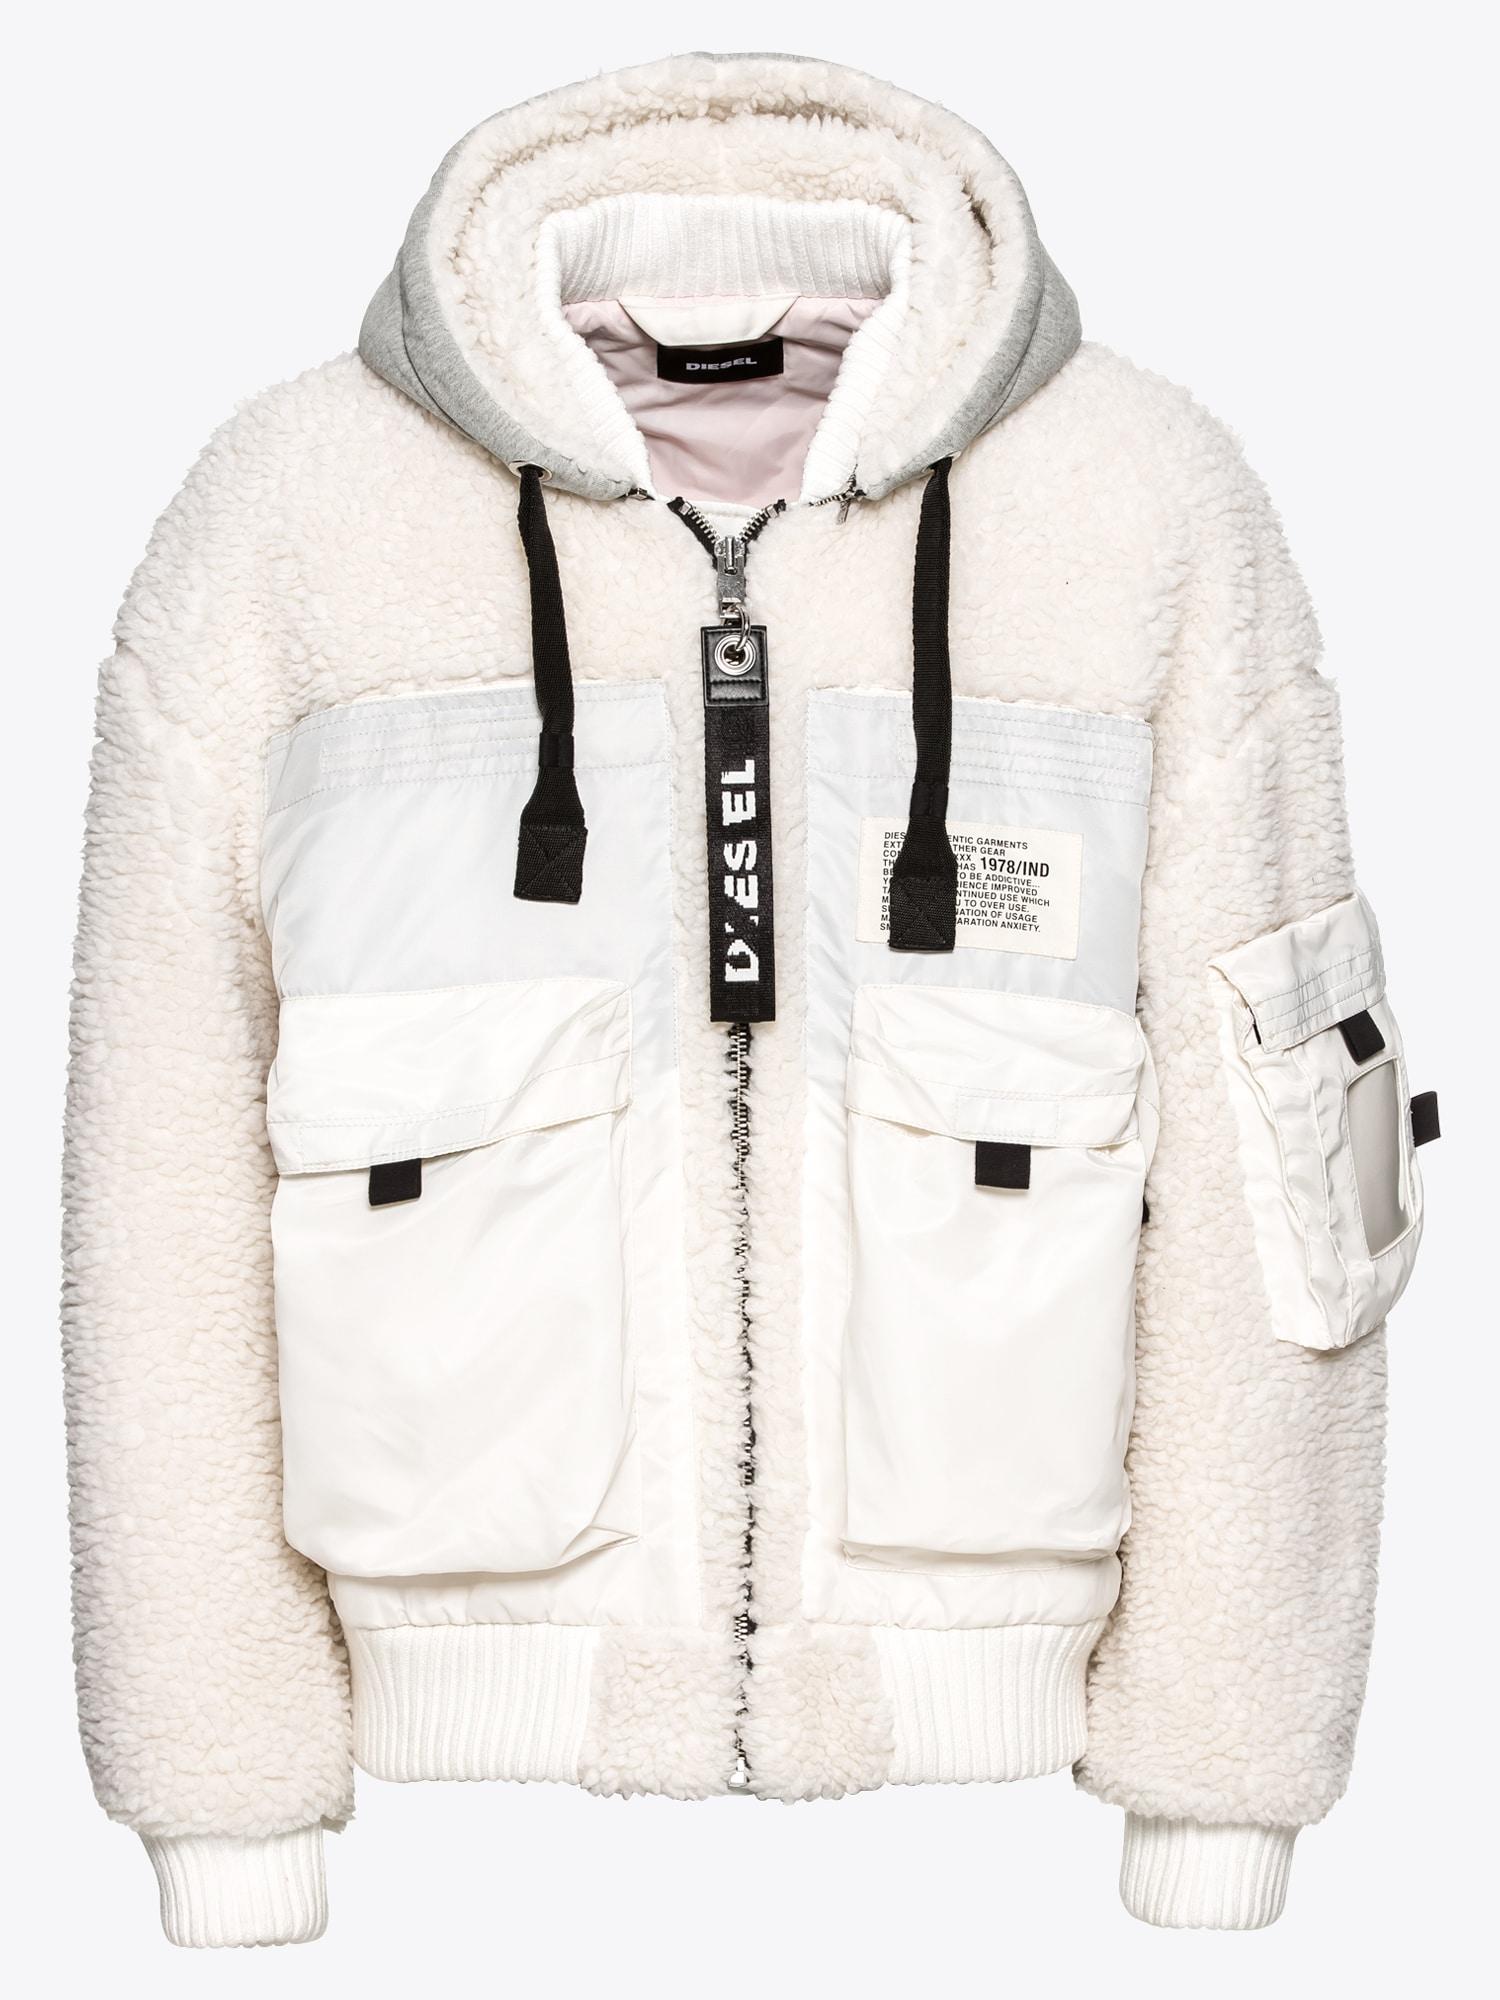 Winterjas Heren Wit.Shop Via Mode Webwinkel Nl